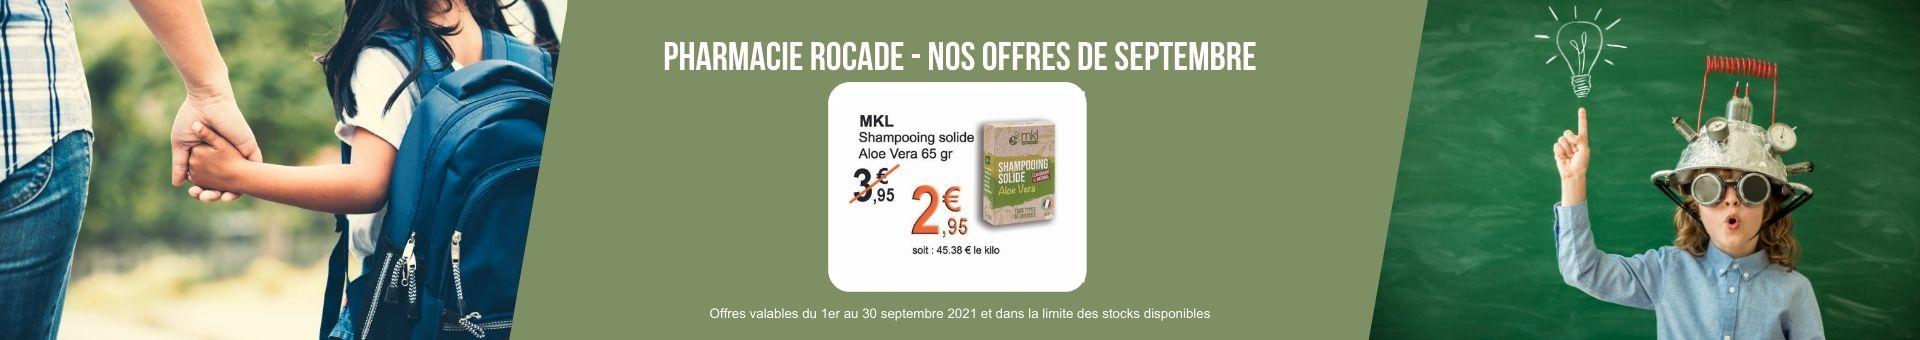 Pharmacie De La Rocade Pessac,Pessac